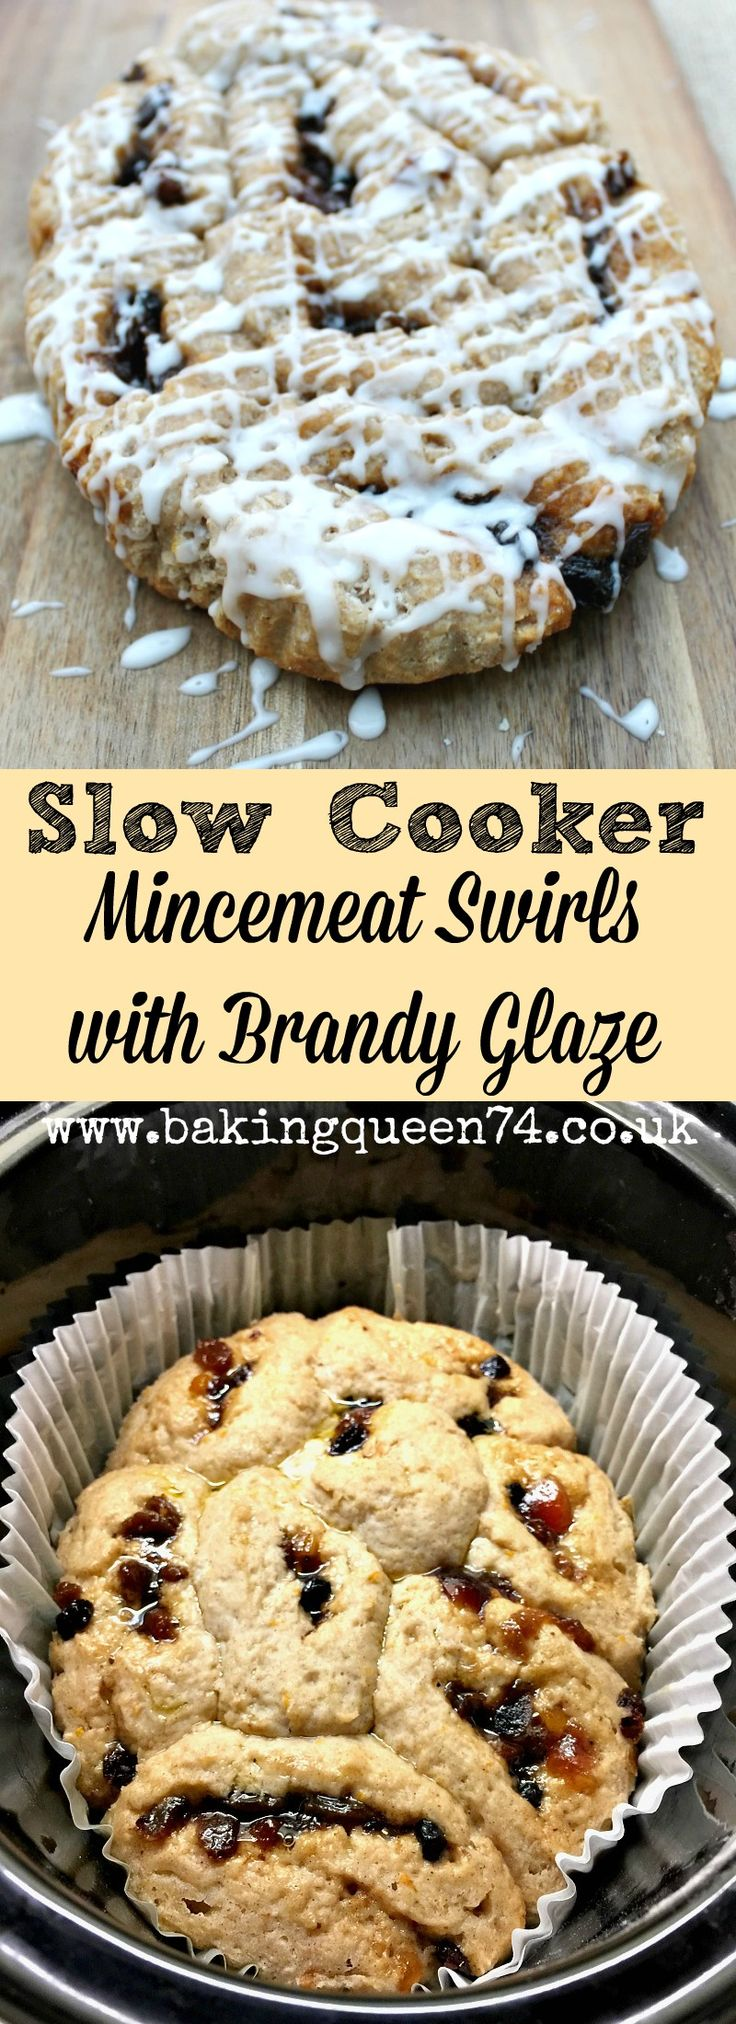 Slow cooker mincemeat swirls with brandy glaze